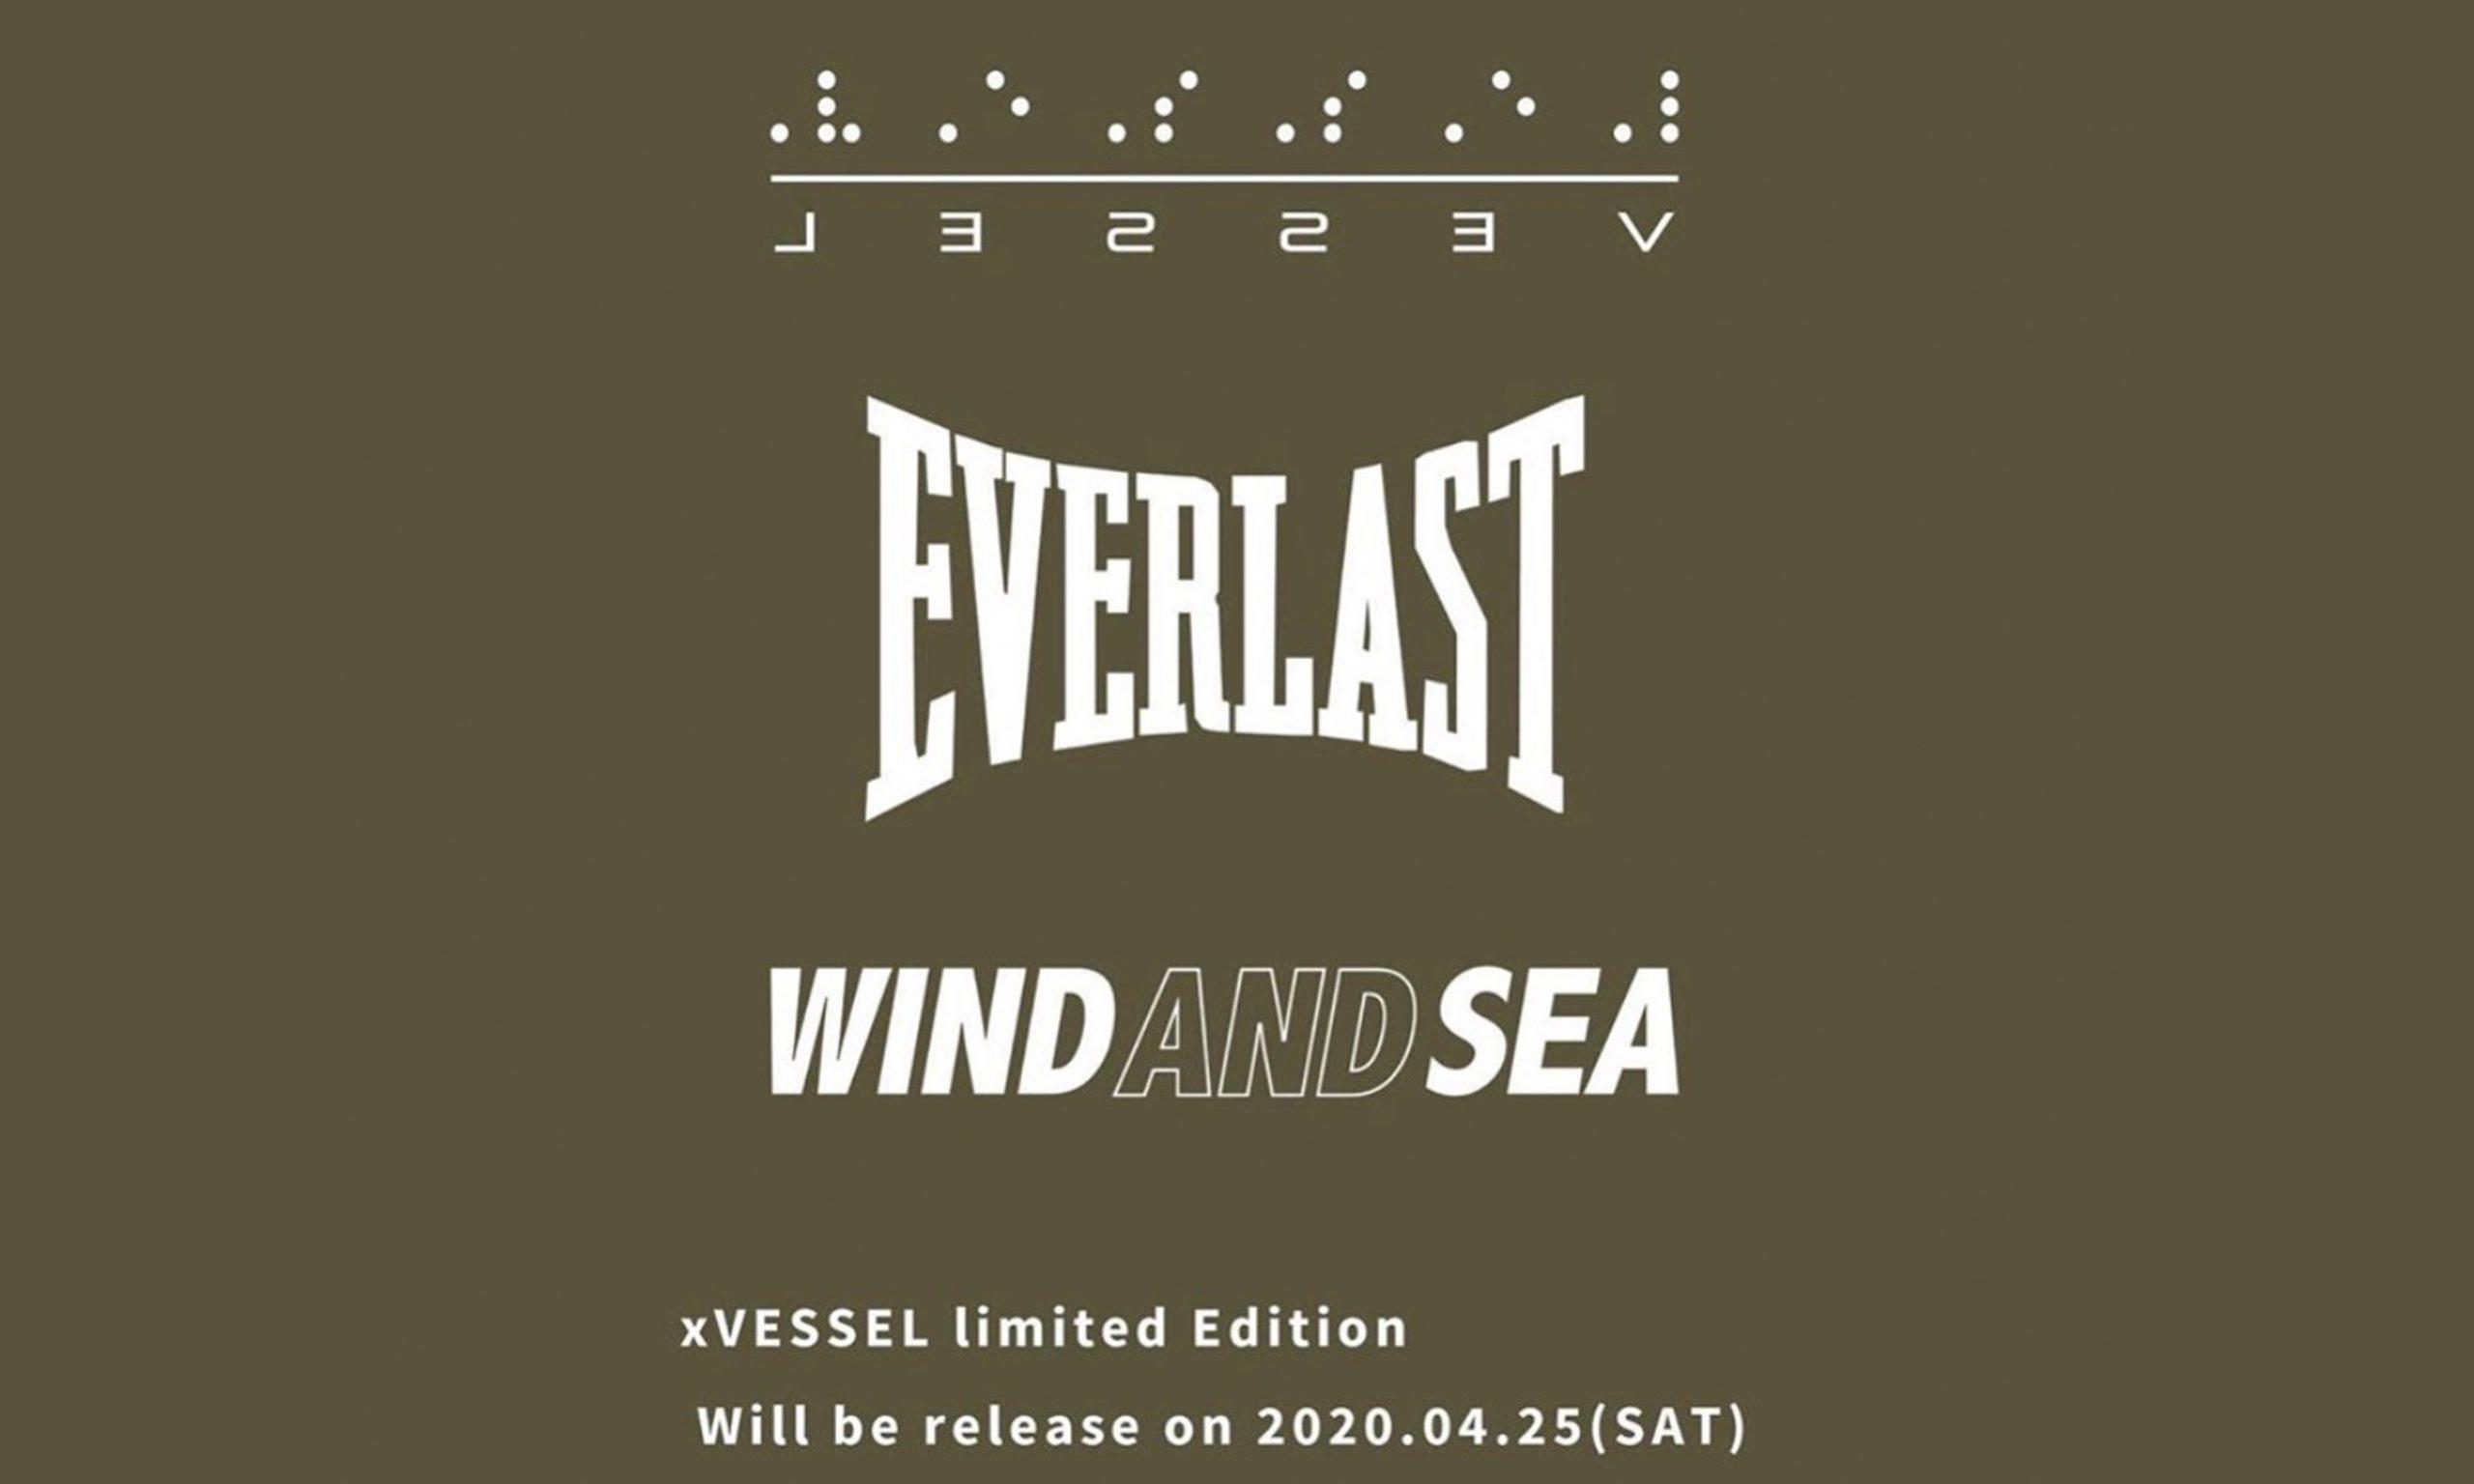 xVESSEL x EVERLAST x WIND AND SEA 三方联名即将发售